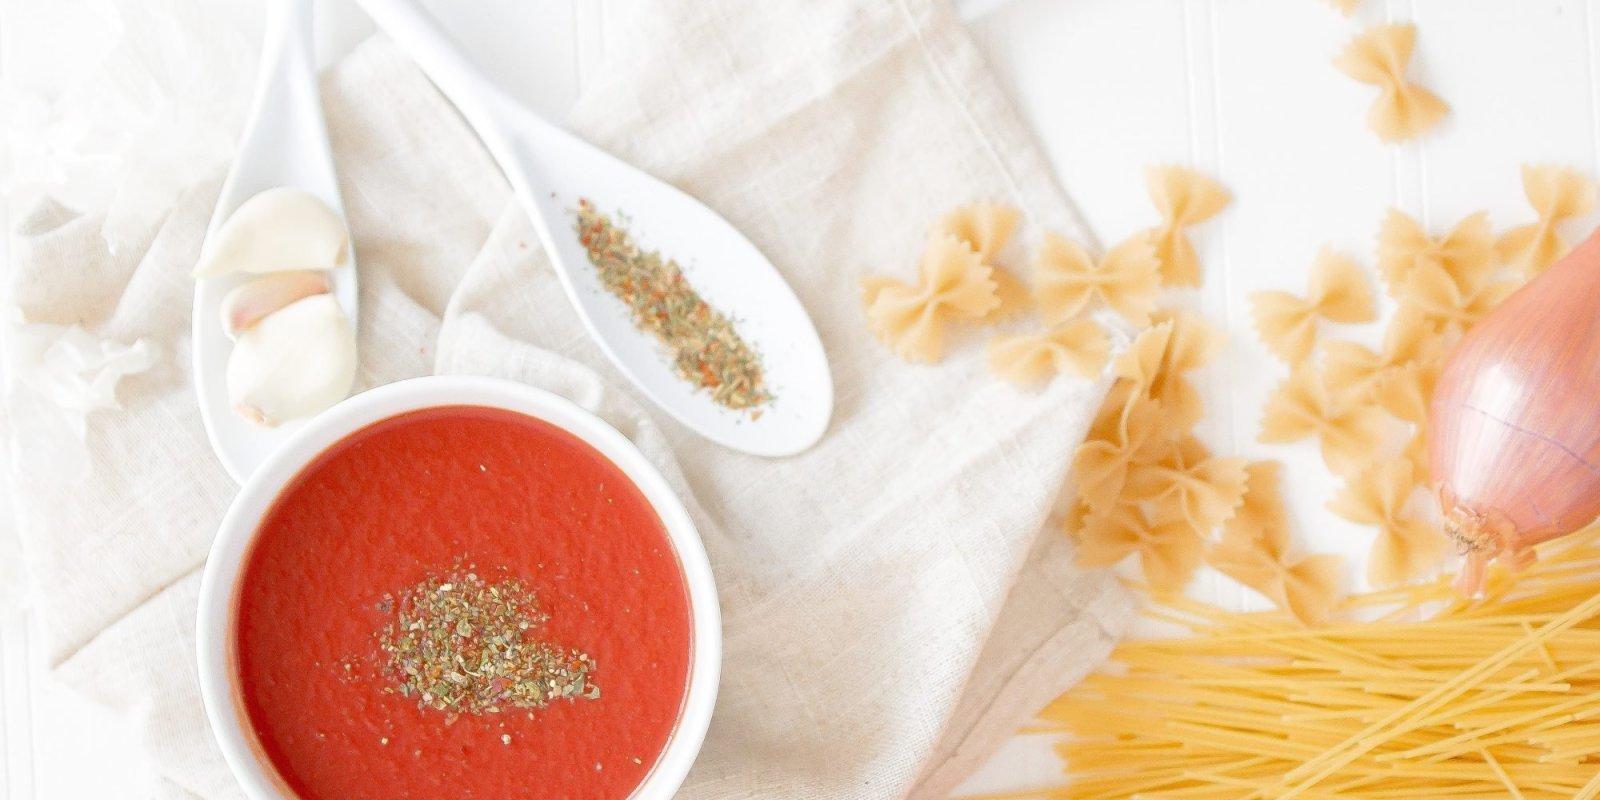 tomato sauce for spaghetti